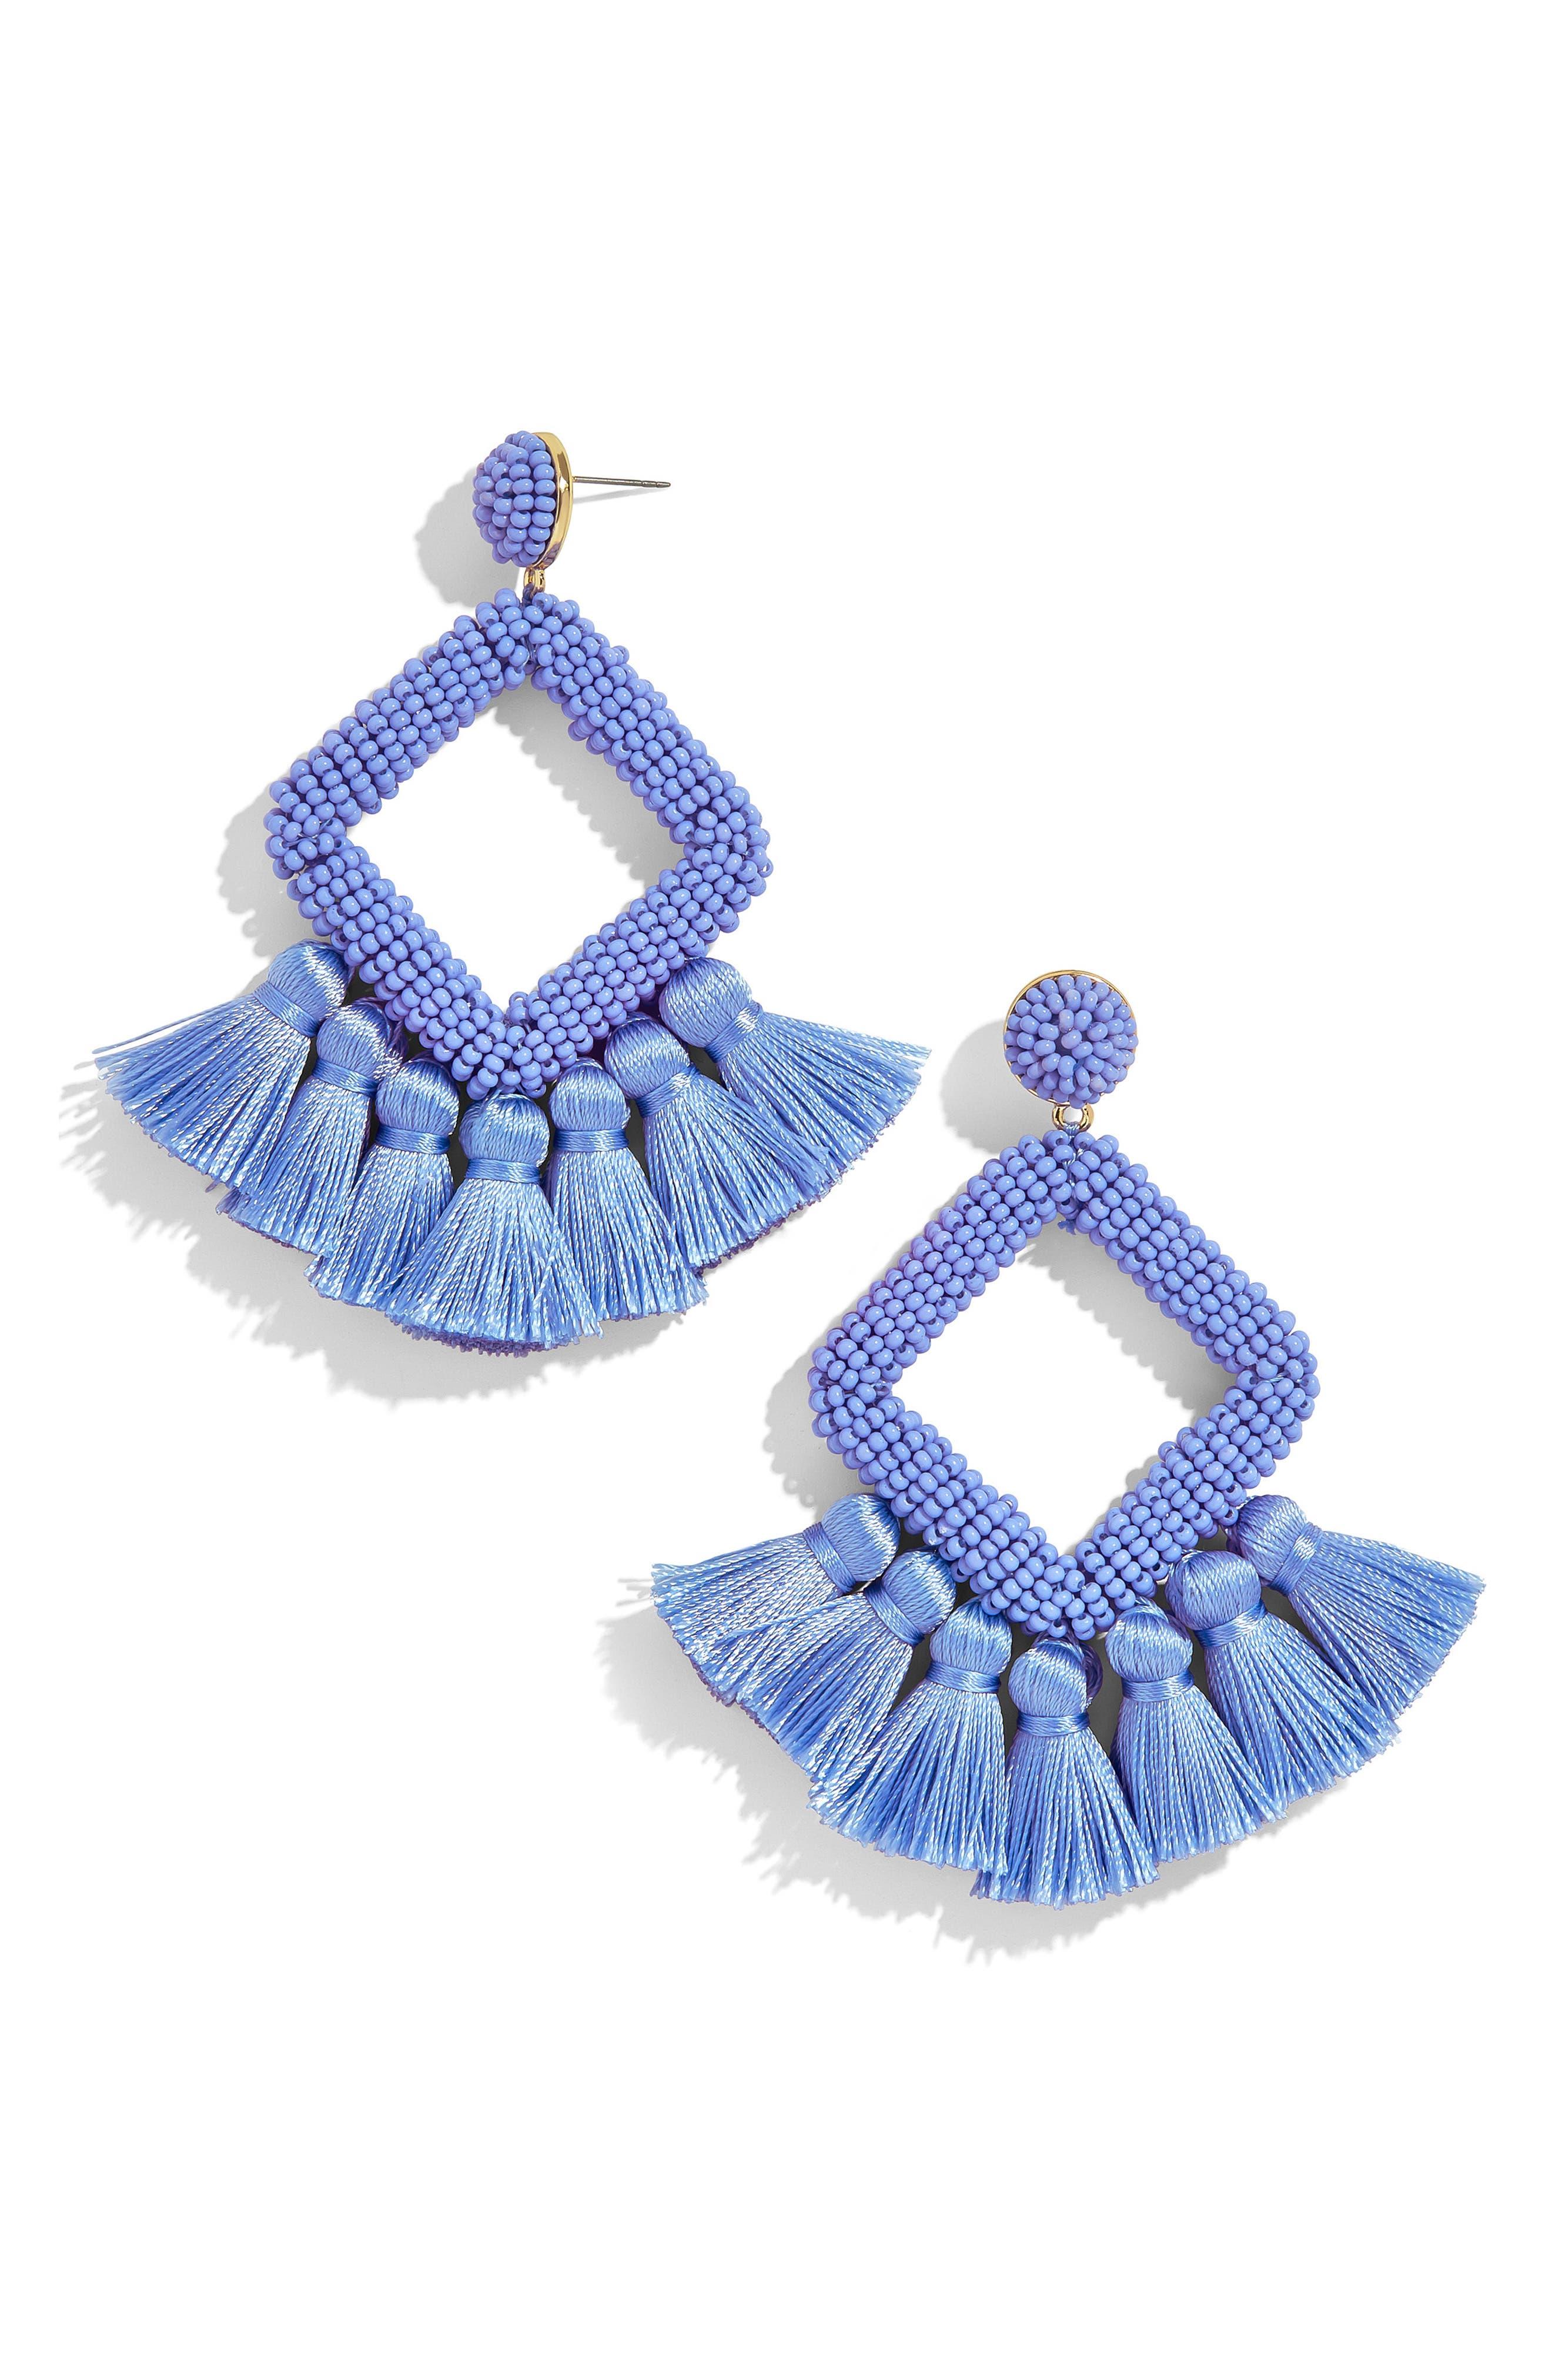 BAUBLEBAR Laniyah Tassel Statement Earrings, Main, color, 400